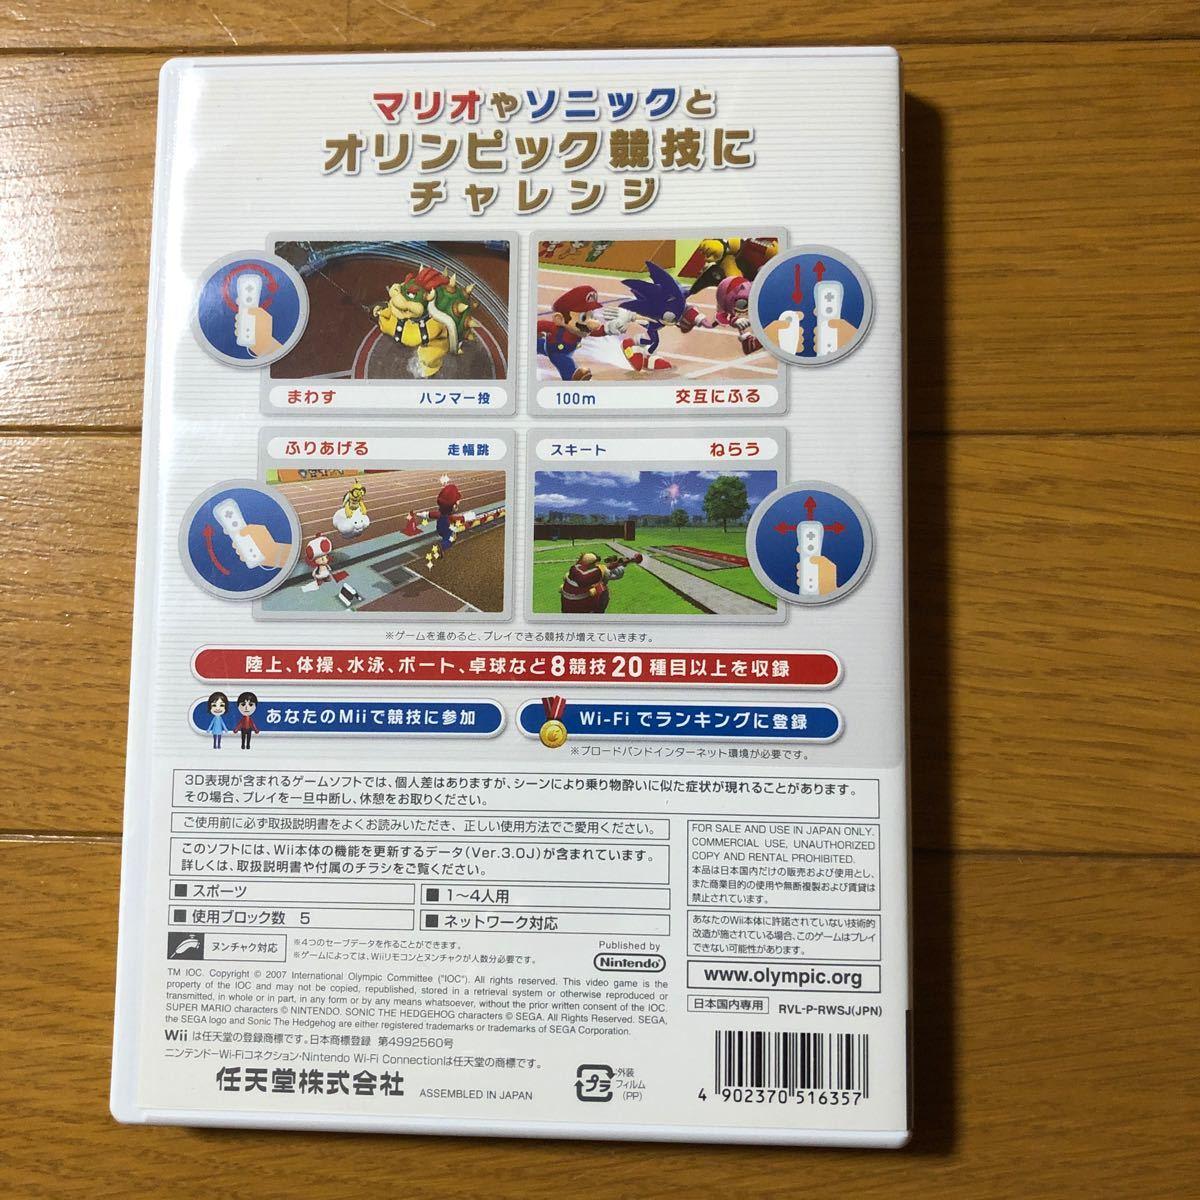 【Wii】 マリオ&ソニック AT 北京オリンピック